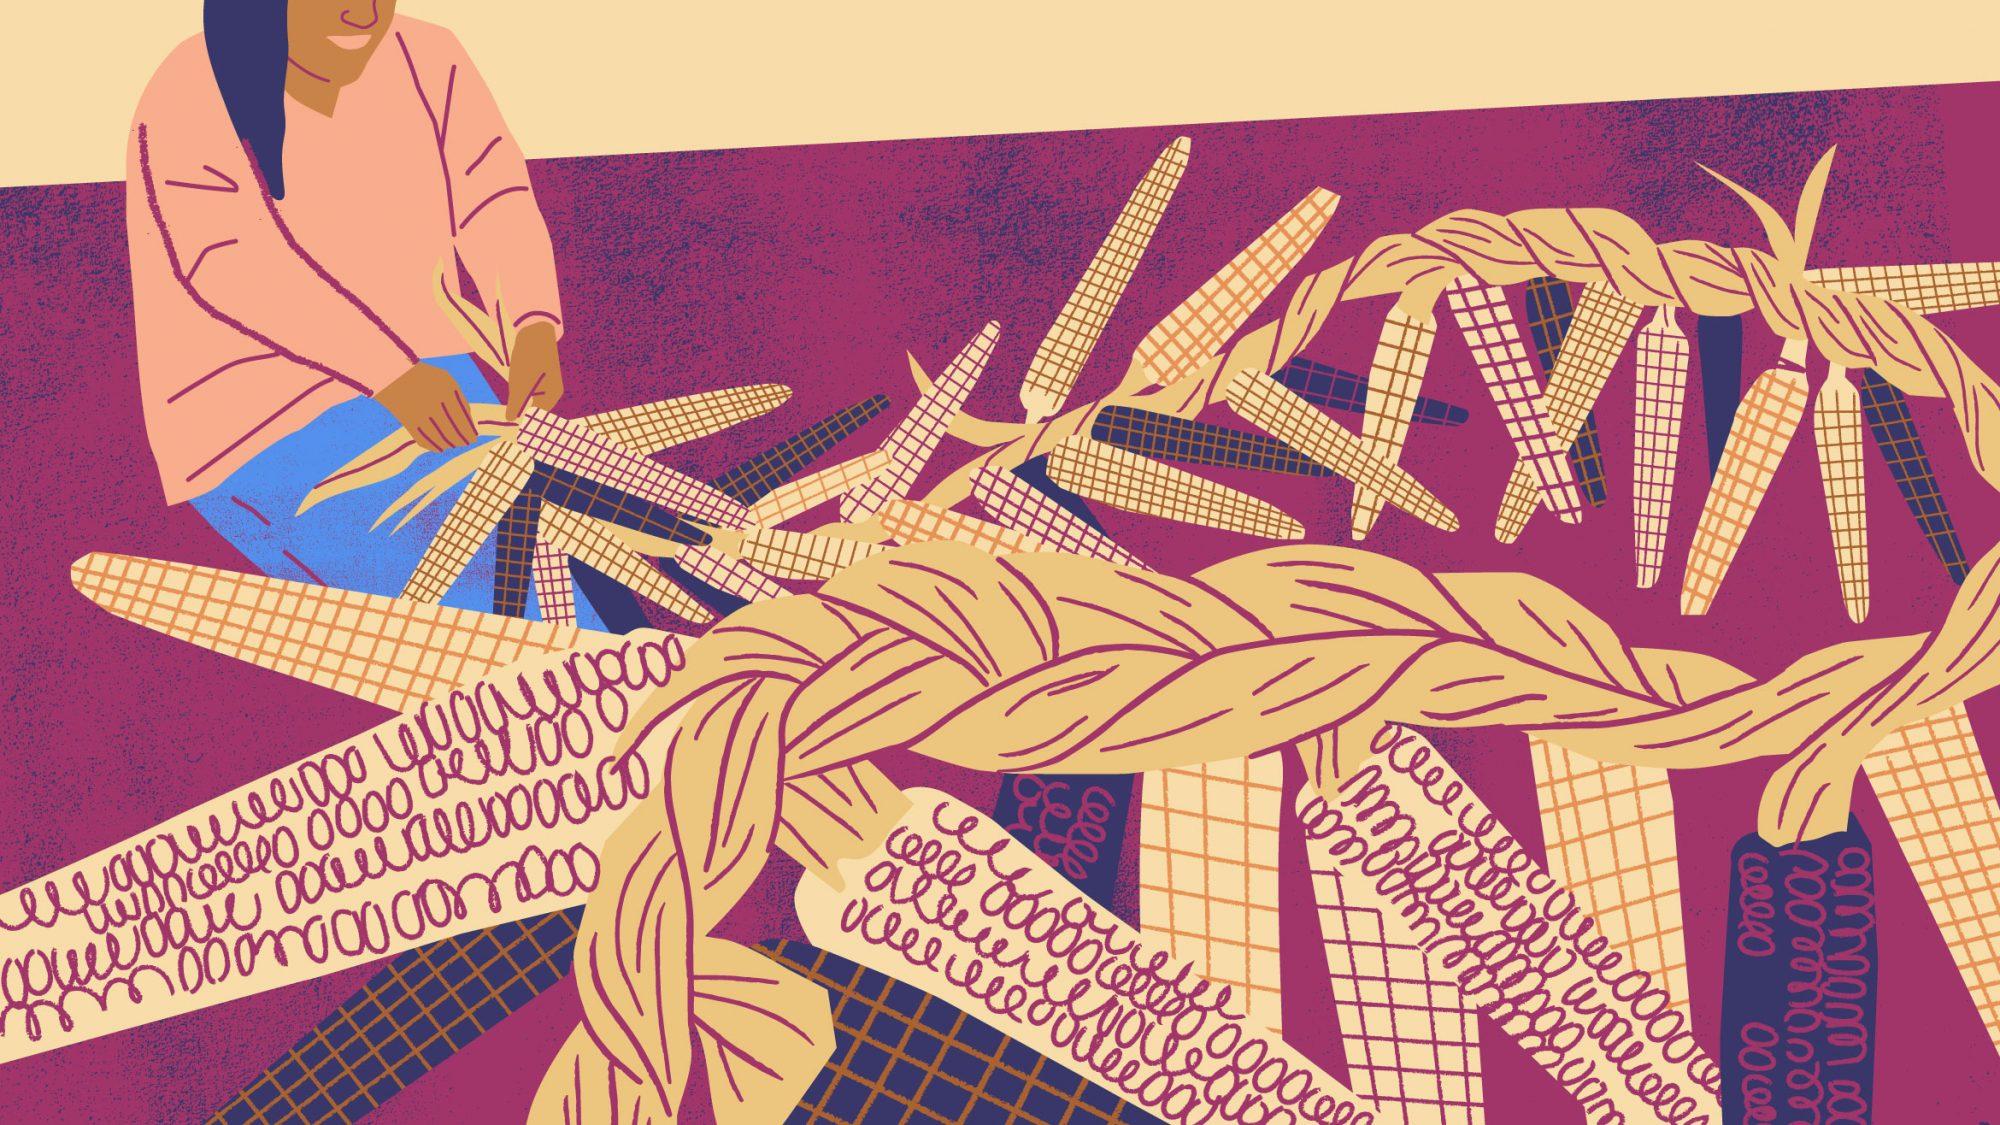 Article-Traditional-Cornmeal-Gakwiyoh-Farms-Iroquois-White-Corn-Project